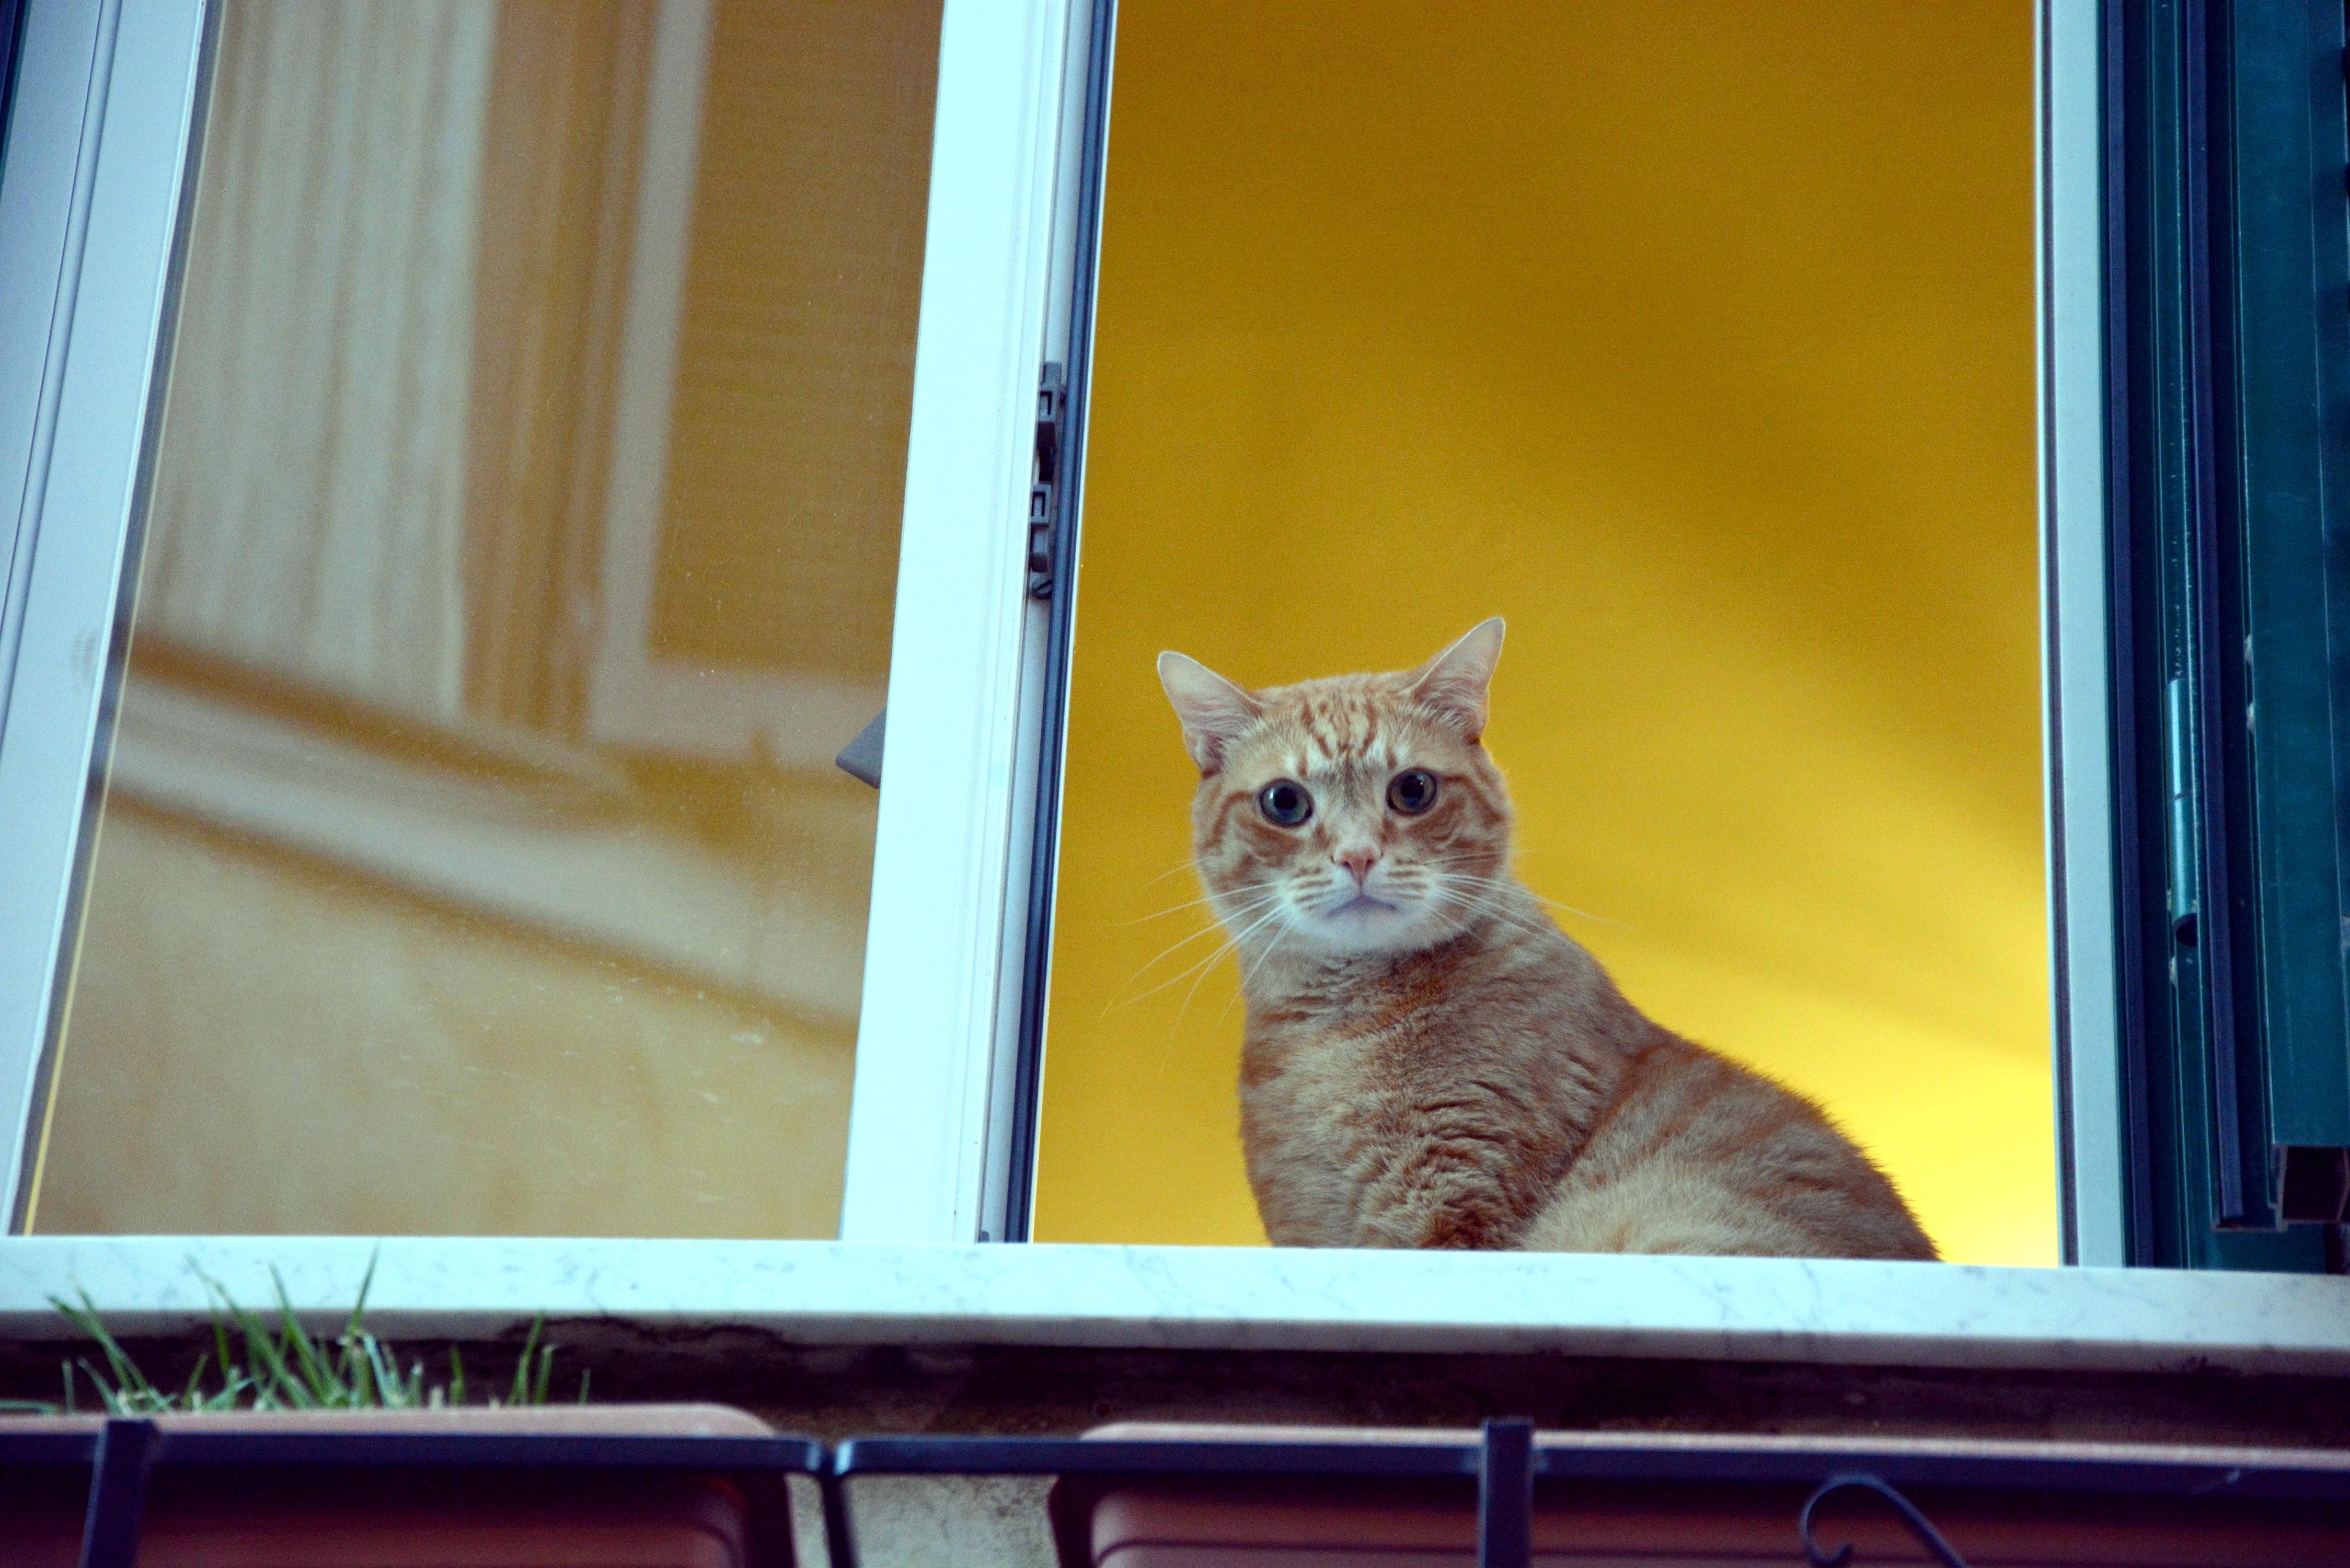 Montecompatri, cat at the window